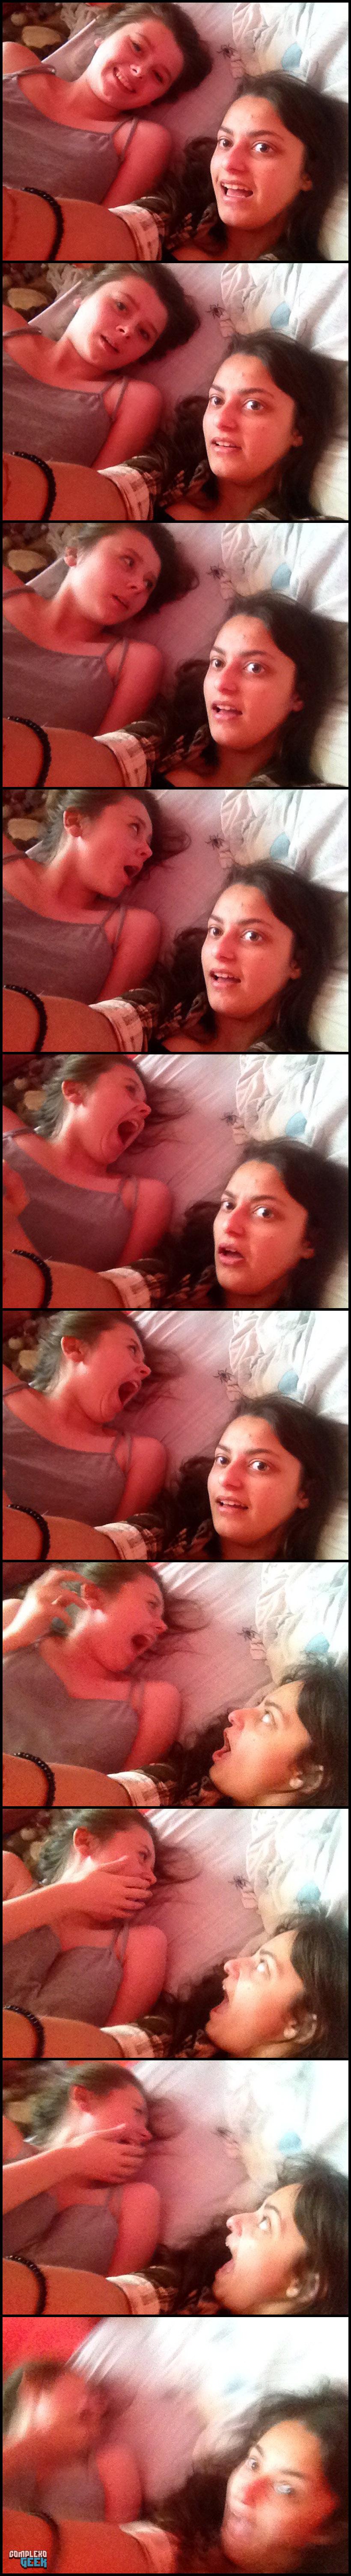 Historia de um selfie